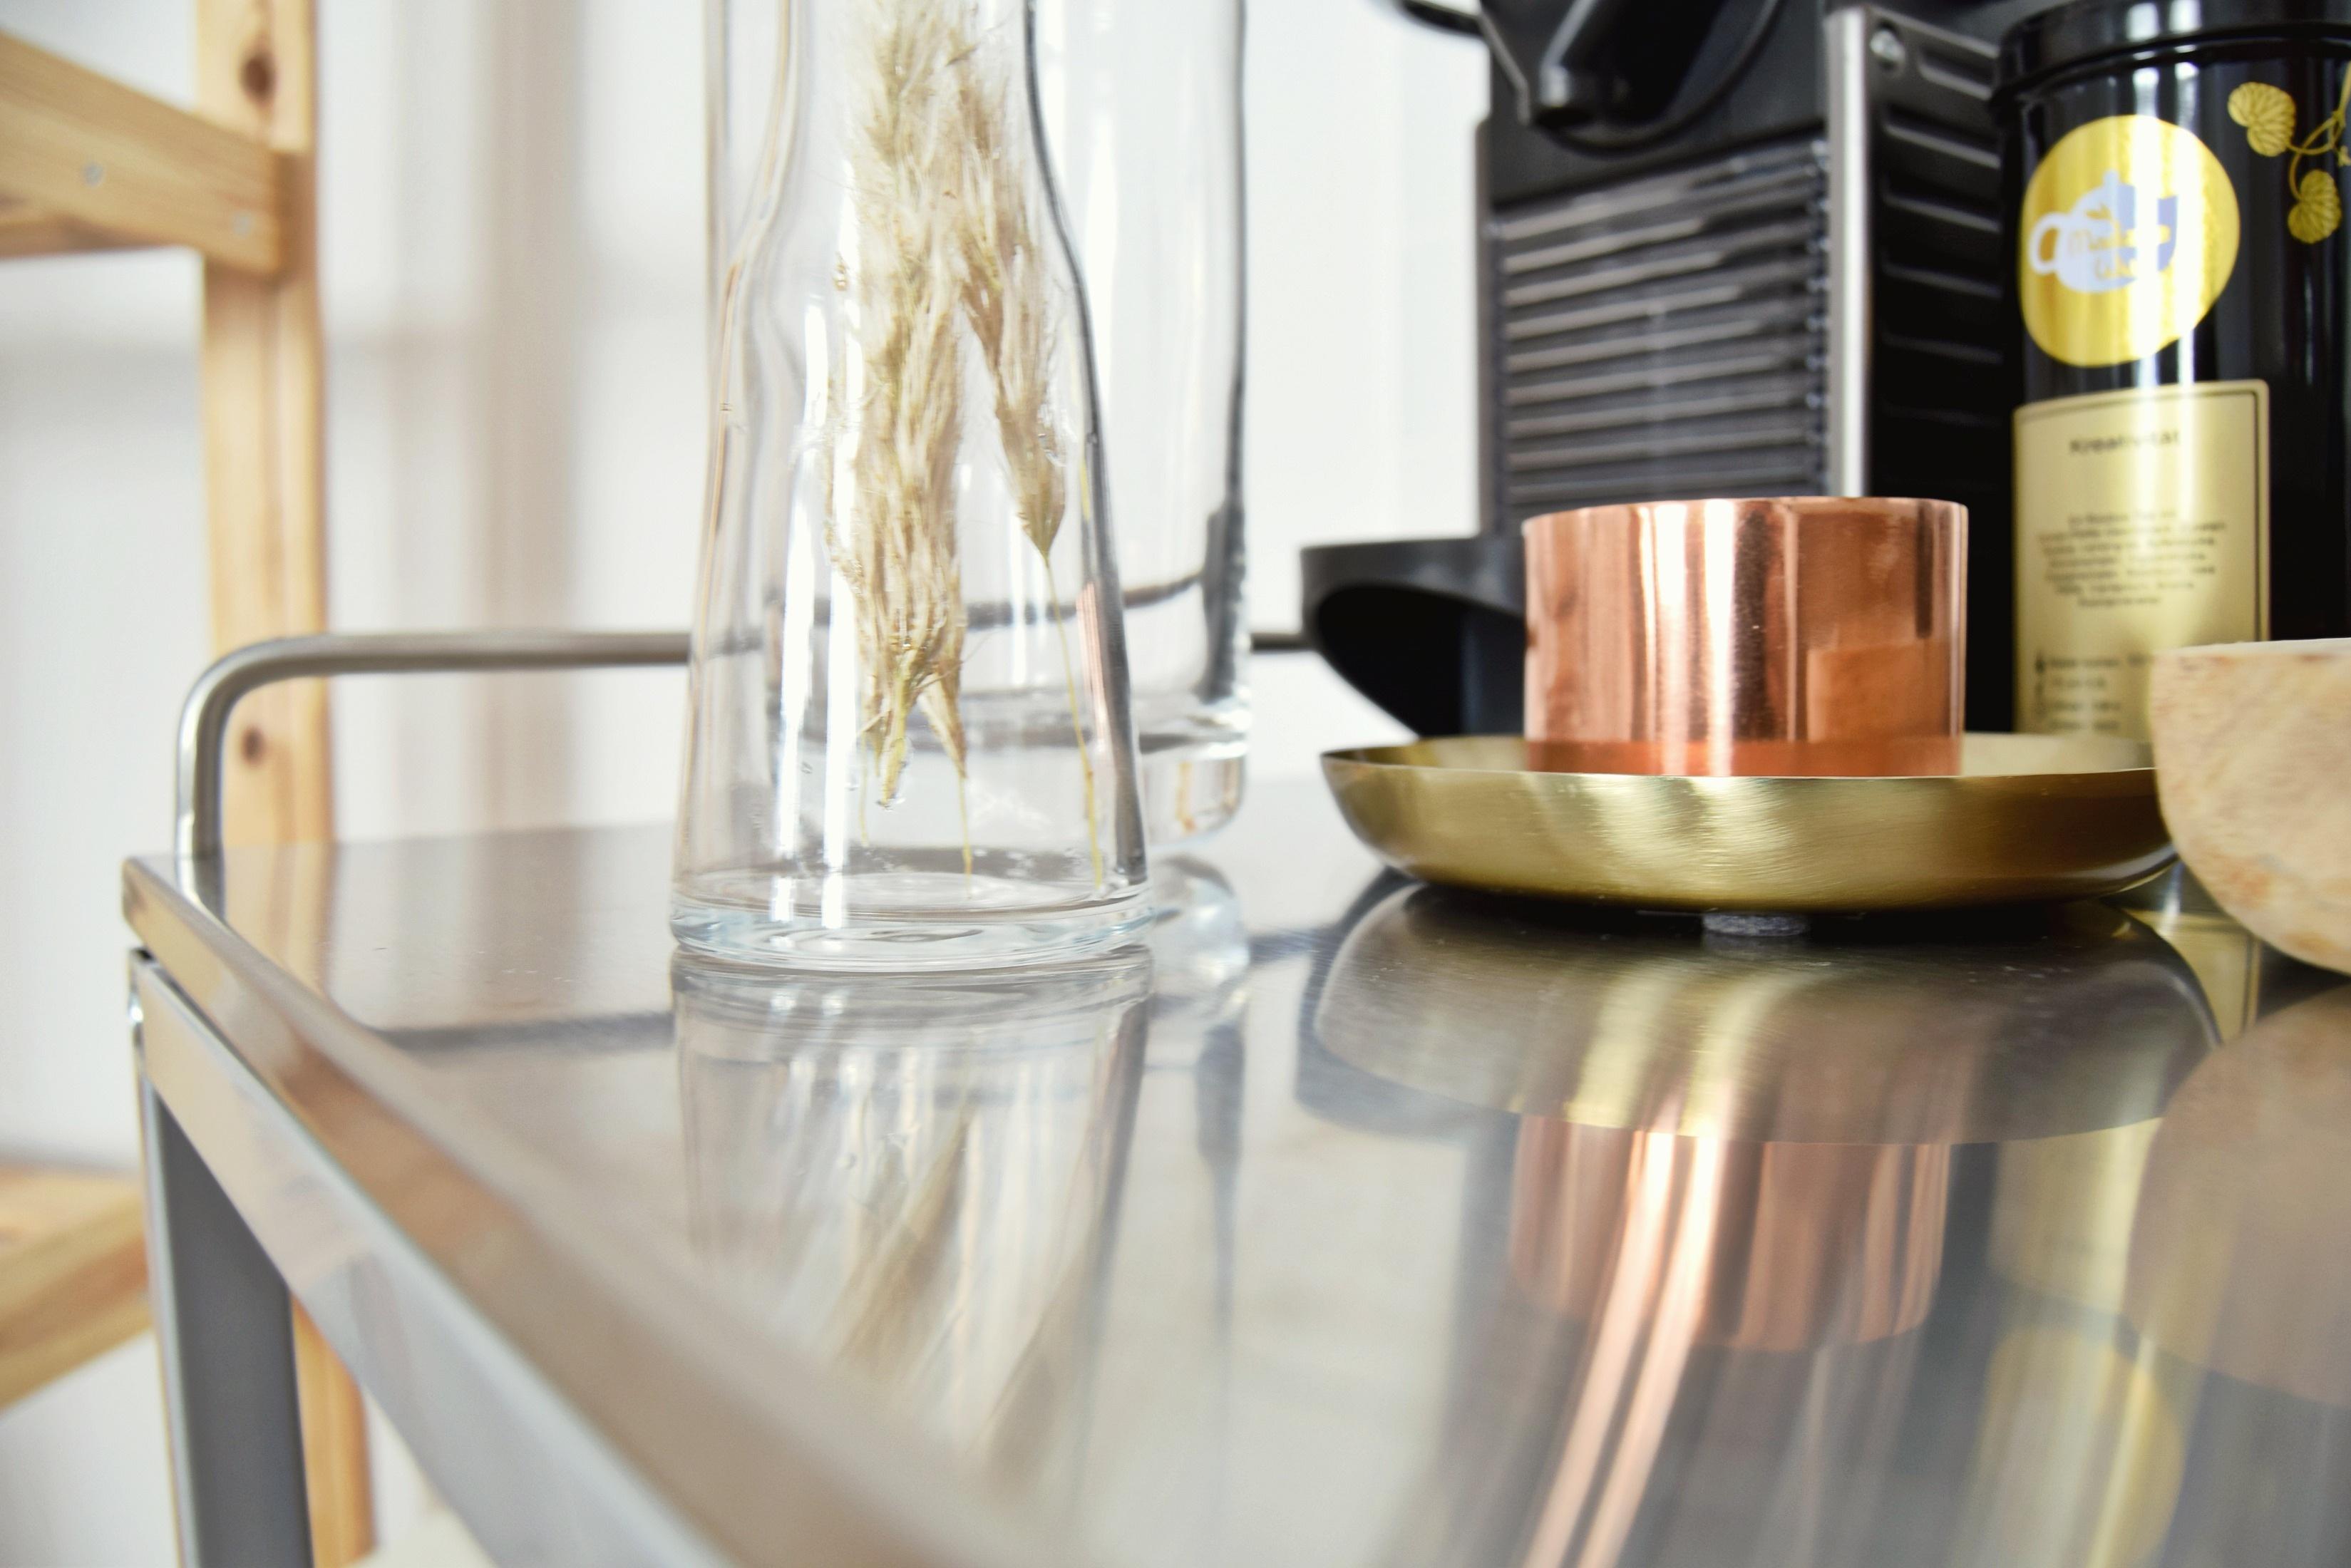 Fotos gratis mesa restaurante comida mueble - Iluminacion habitacion ...